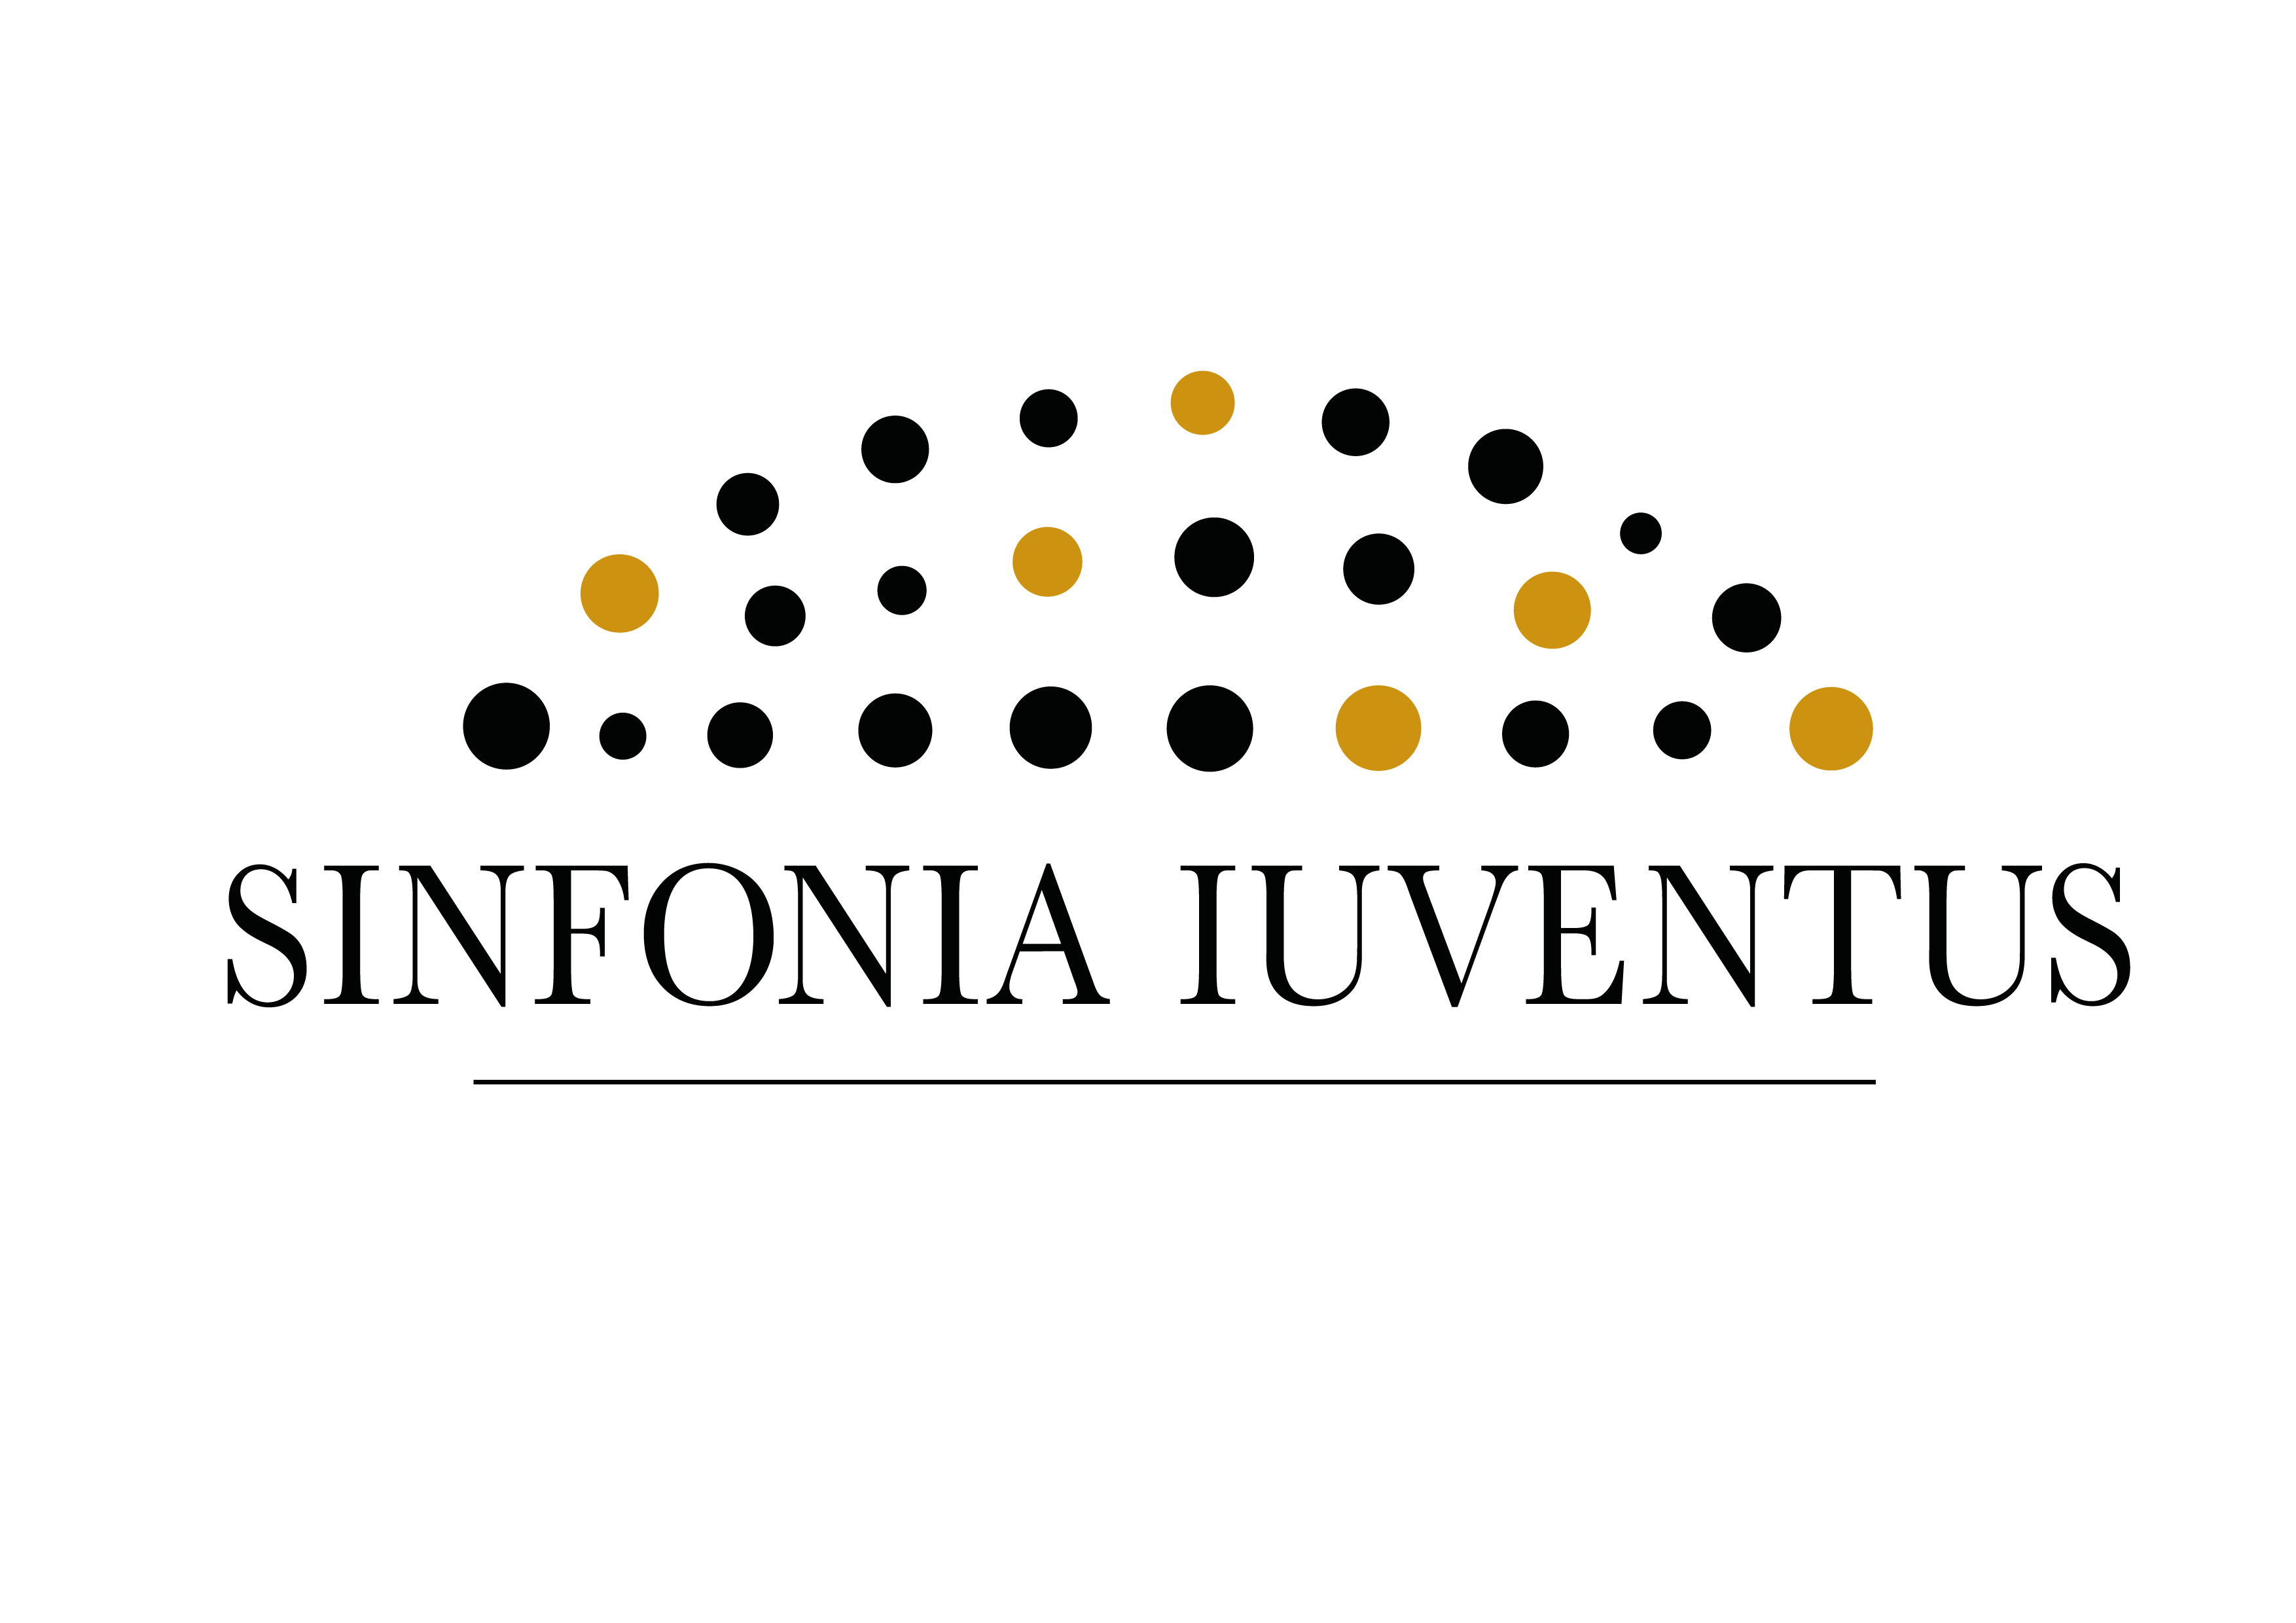 Logo Sinfonii Iuventus